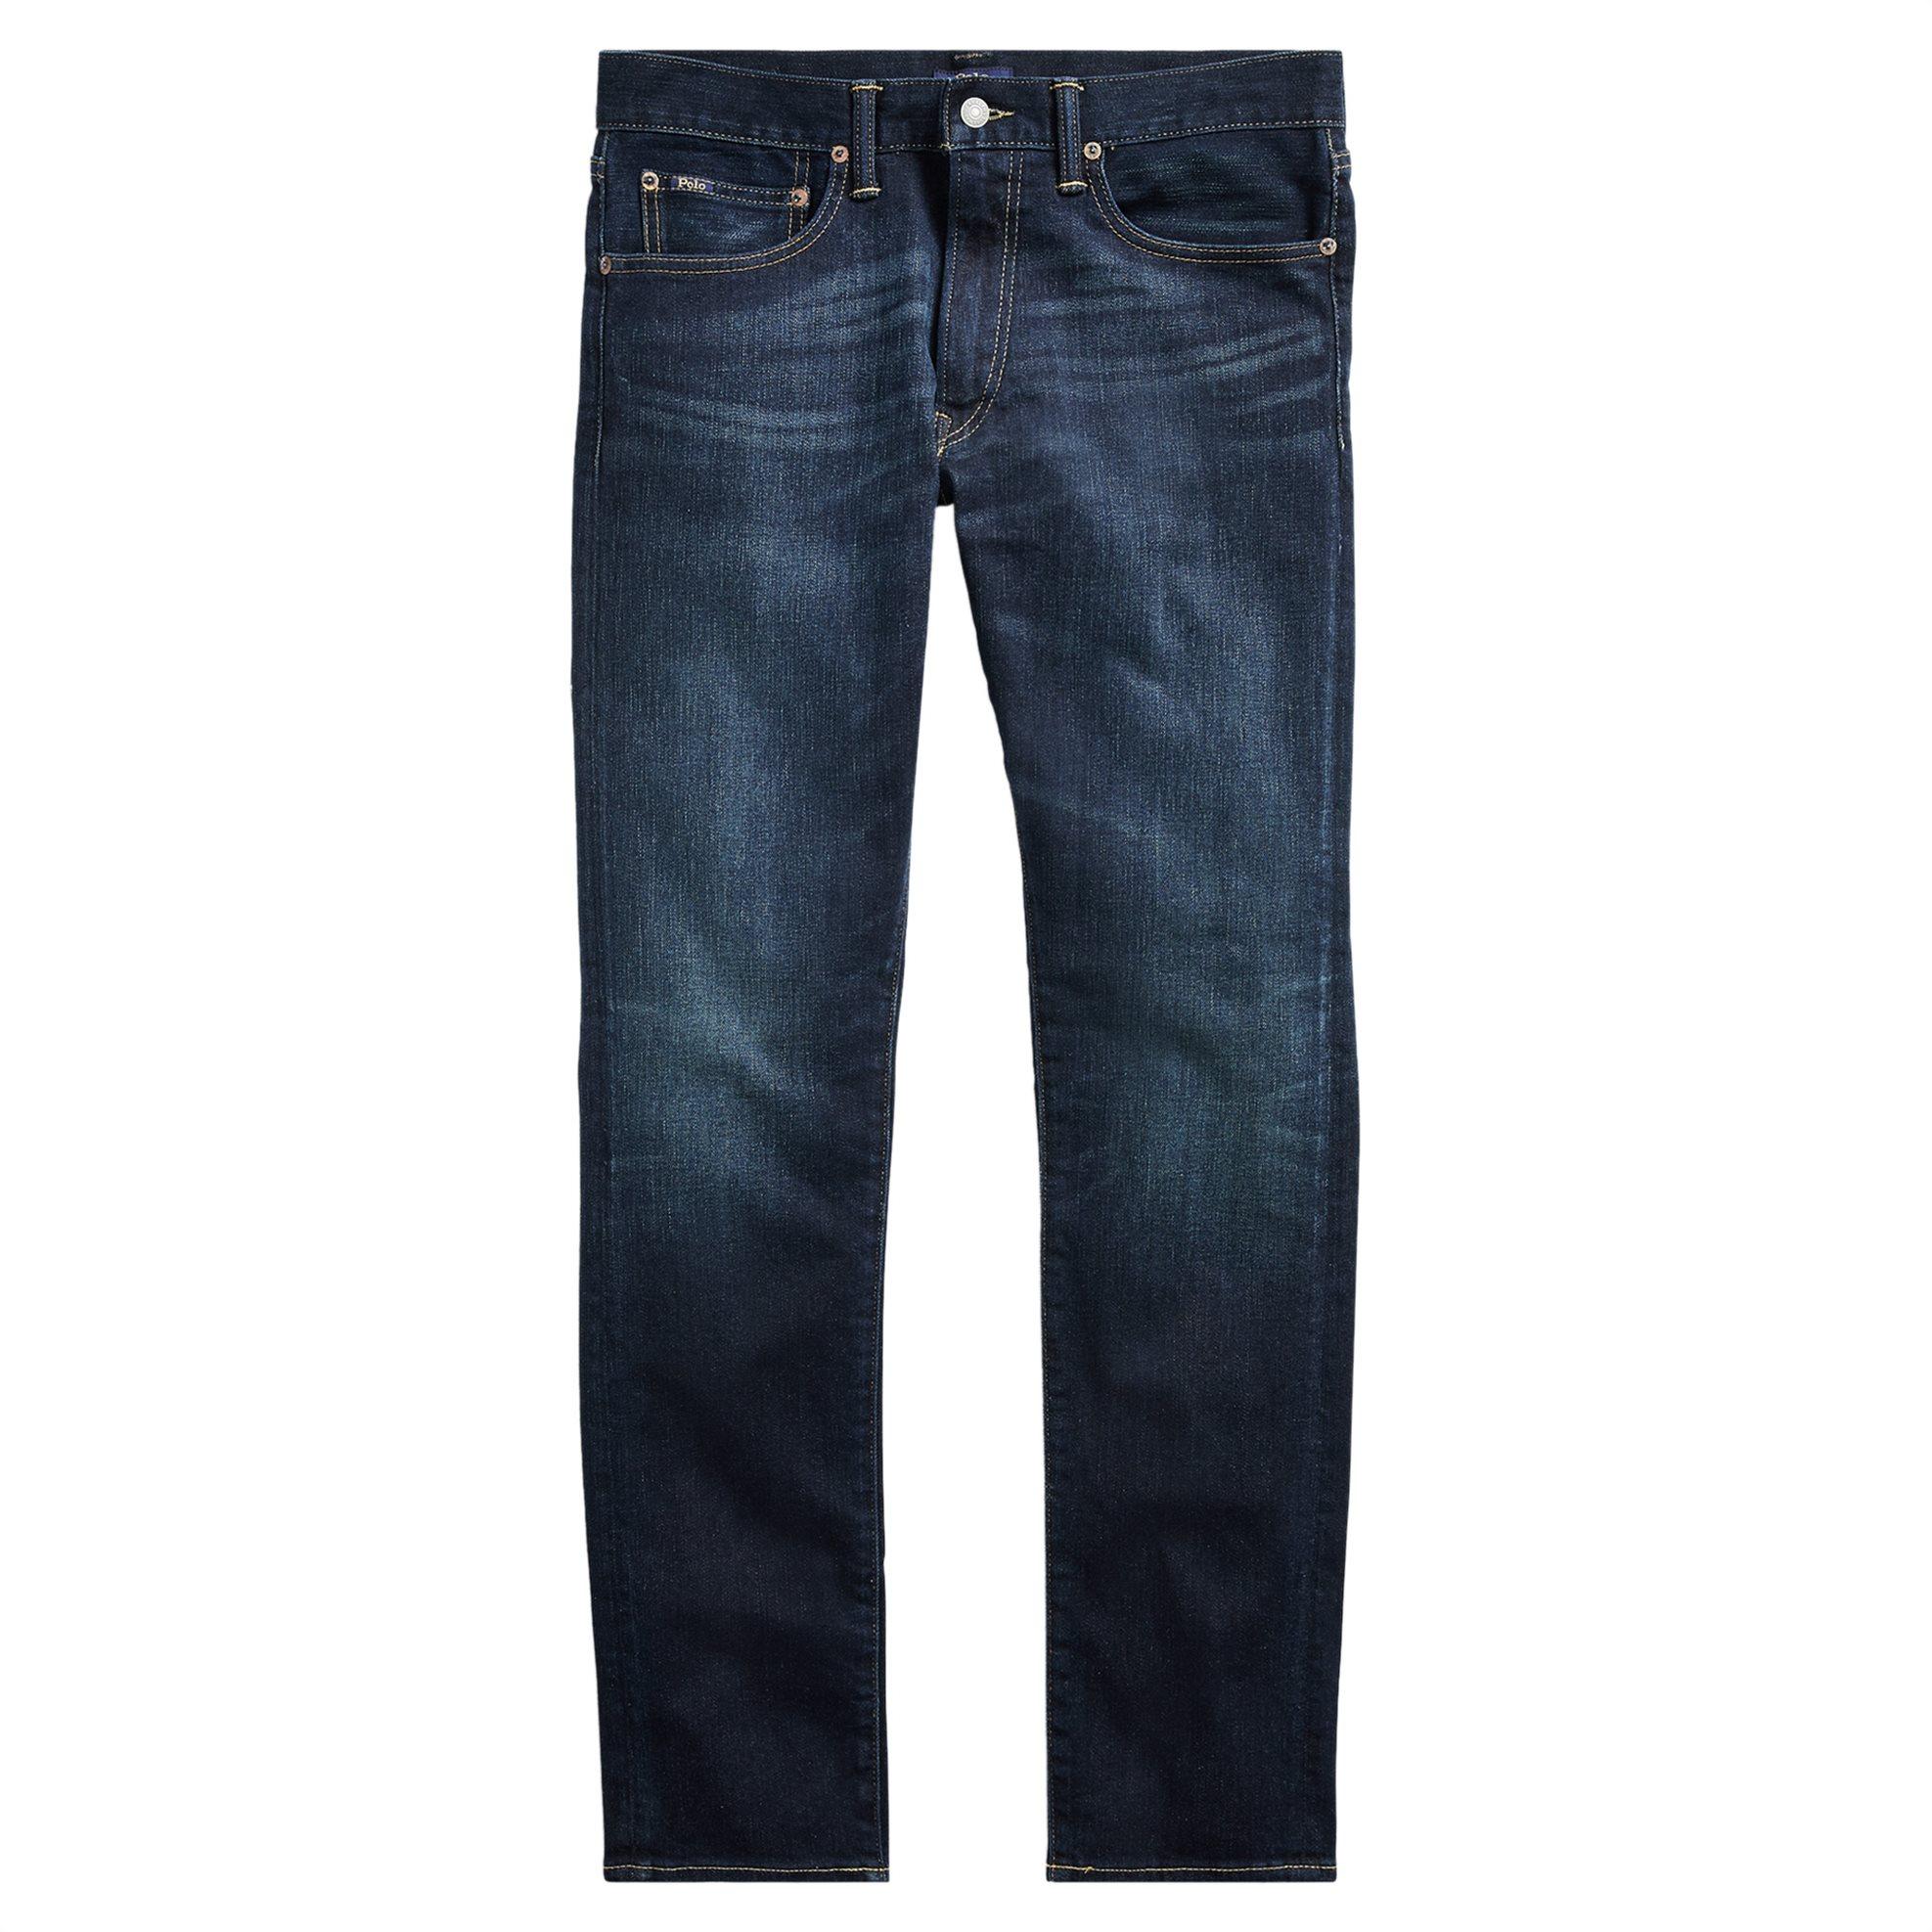 479103a4fb6e Notos Polo Ralph Lauren ανδρικό τζην παντελόνι Sullivan Slim Stretch -  710613950023 - Μπλε Σκούρο